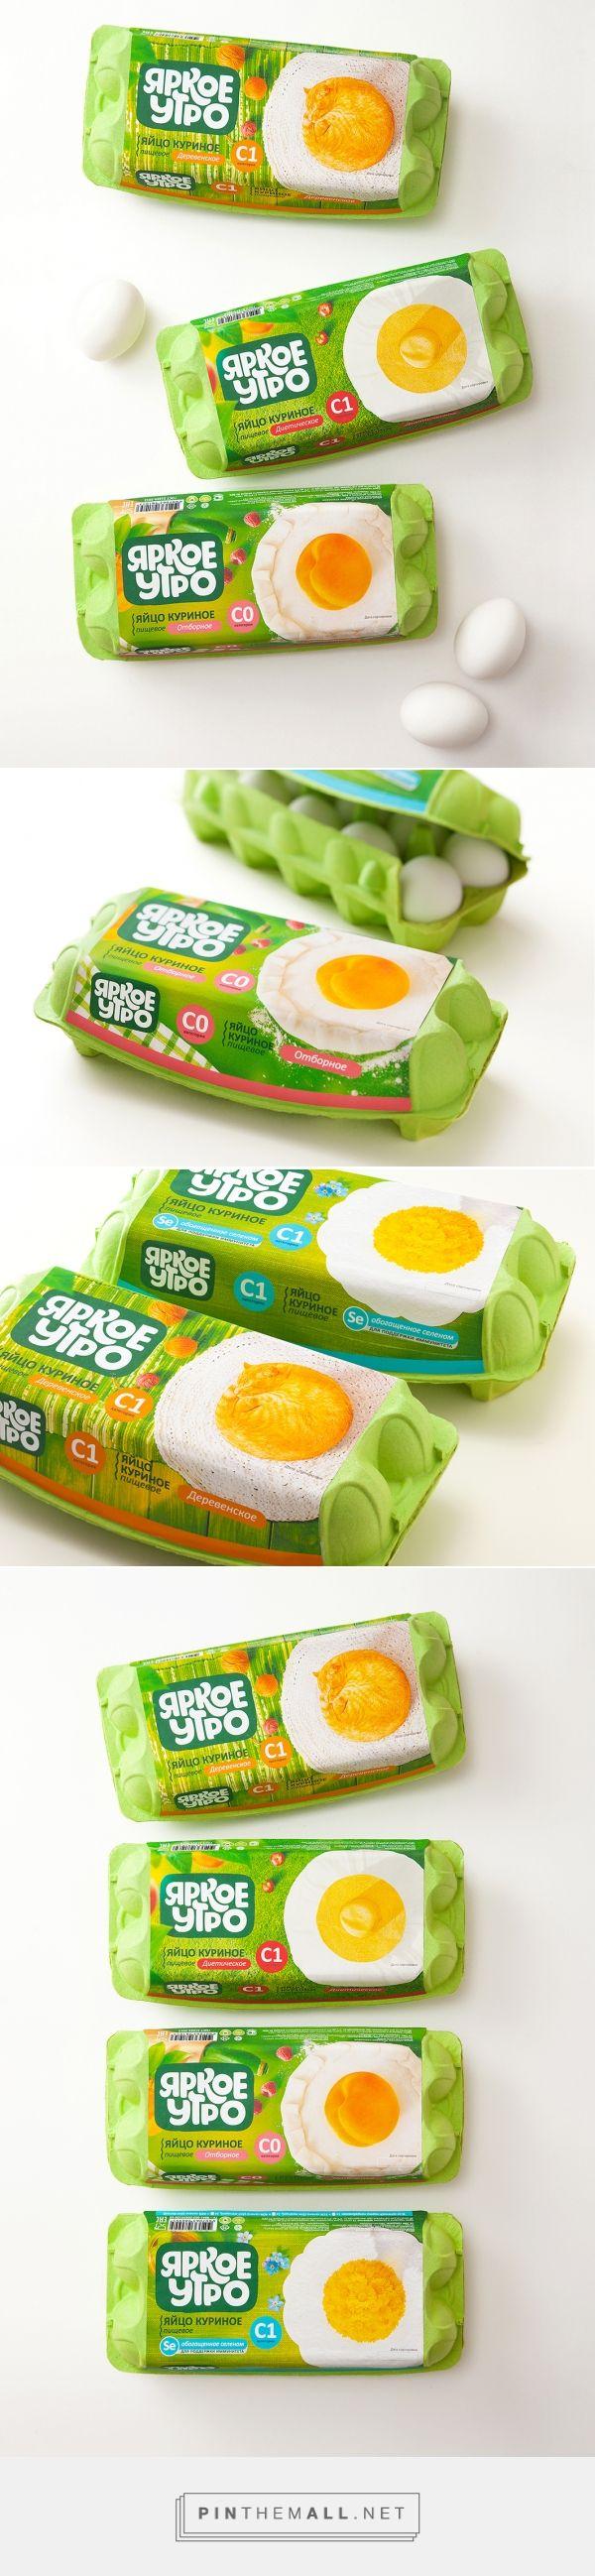 Bright Morning #egg #packaging #design by Brandiziac - http://www.packagingoftheworld.com/2017/04/bright-morning.html